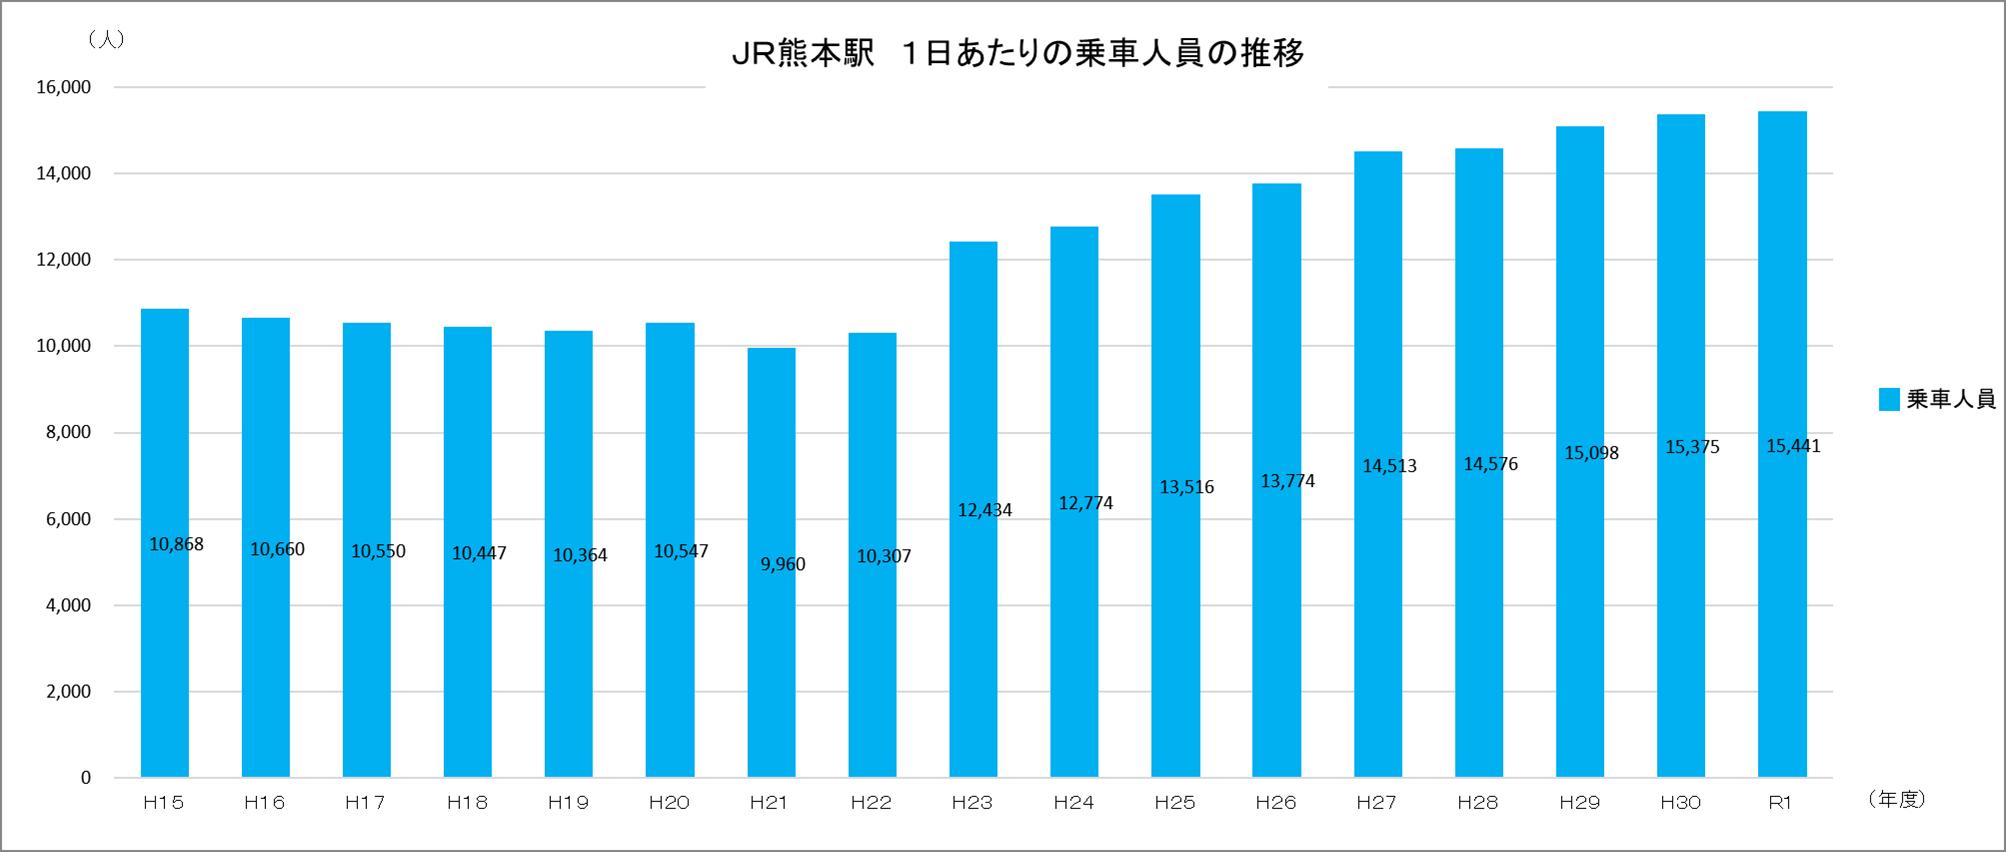 JR熊本駅 一日あたりの乗車人員の推移